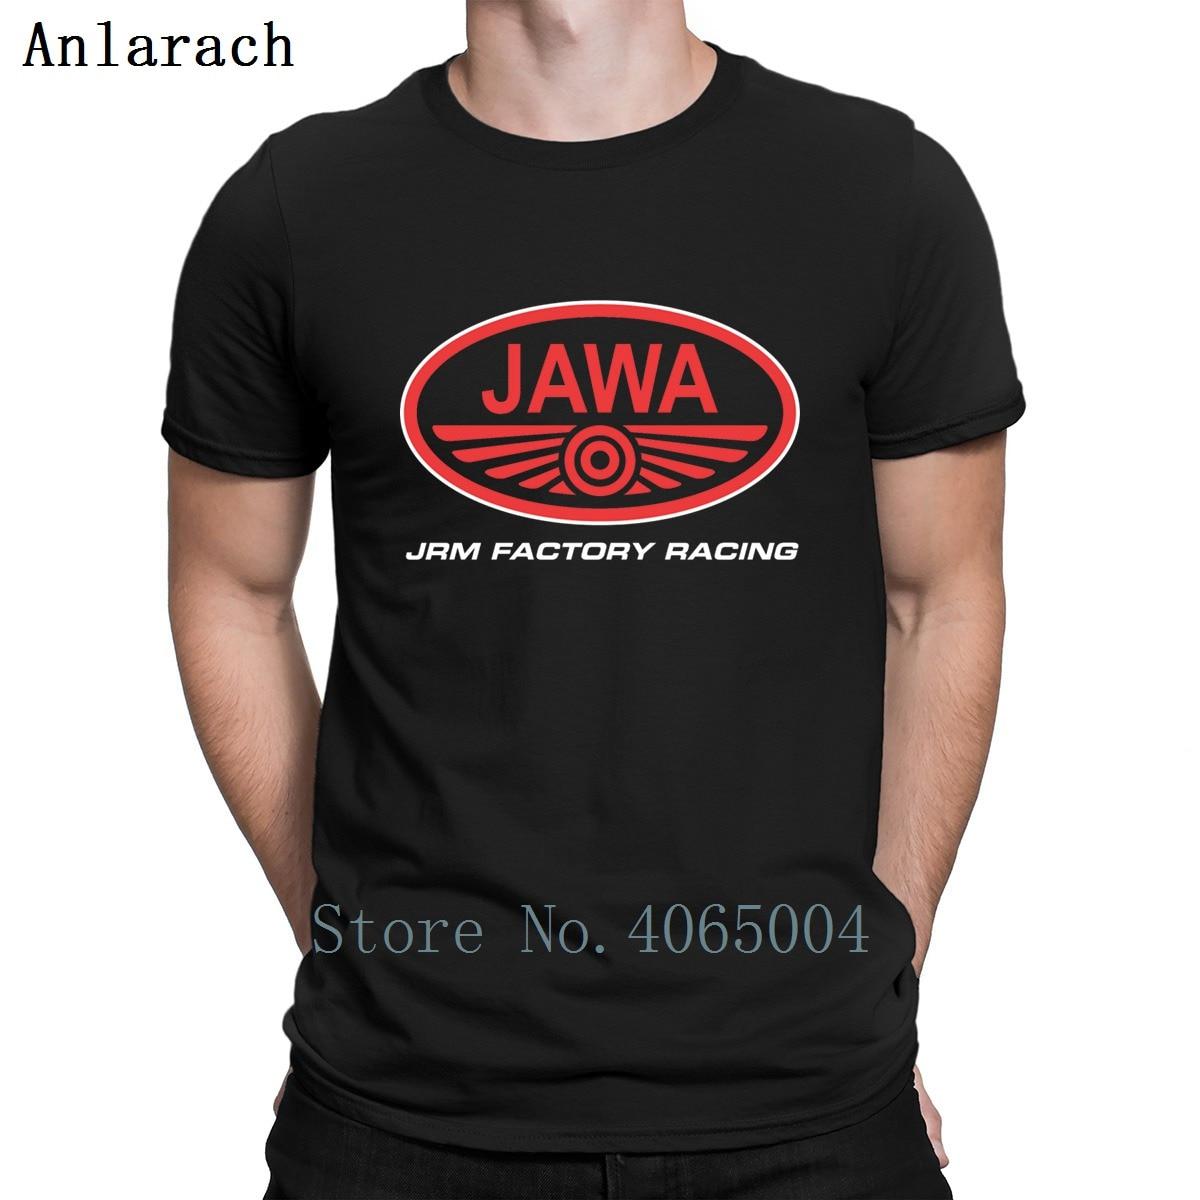 Jawa Logo T Shirt Fitness Cotton Personalized Formal Leisure Summer Basic Size S-3xl Shirt